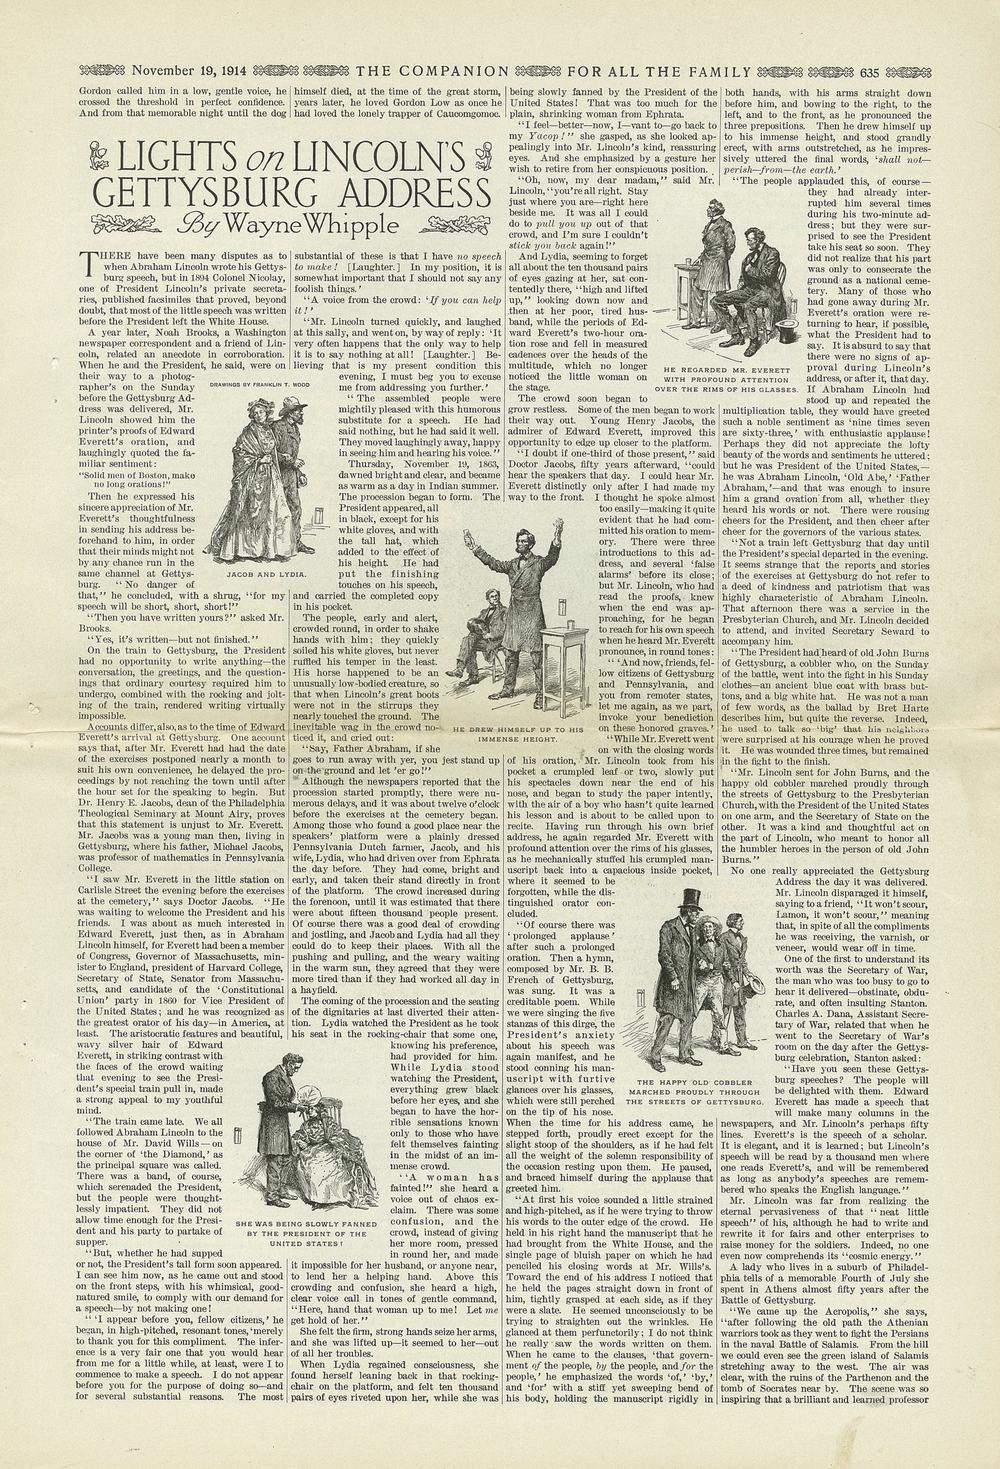 The Youth's Companion - November 19th, 1914, New England Edition, Vol. 88, No. 47